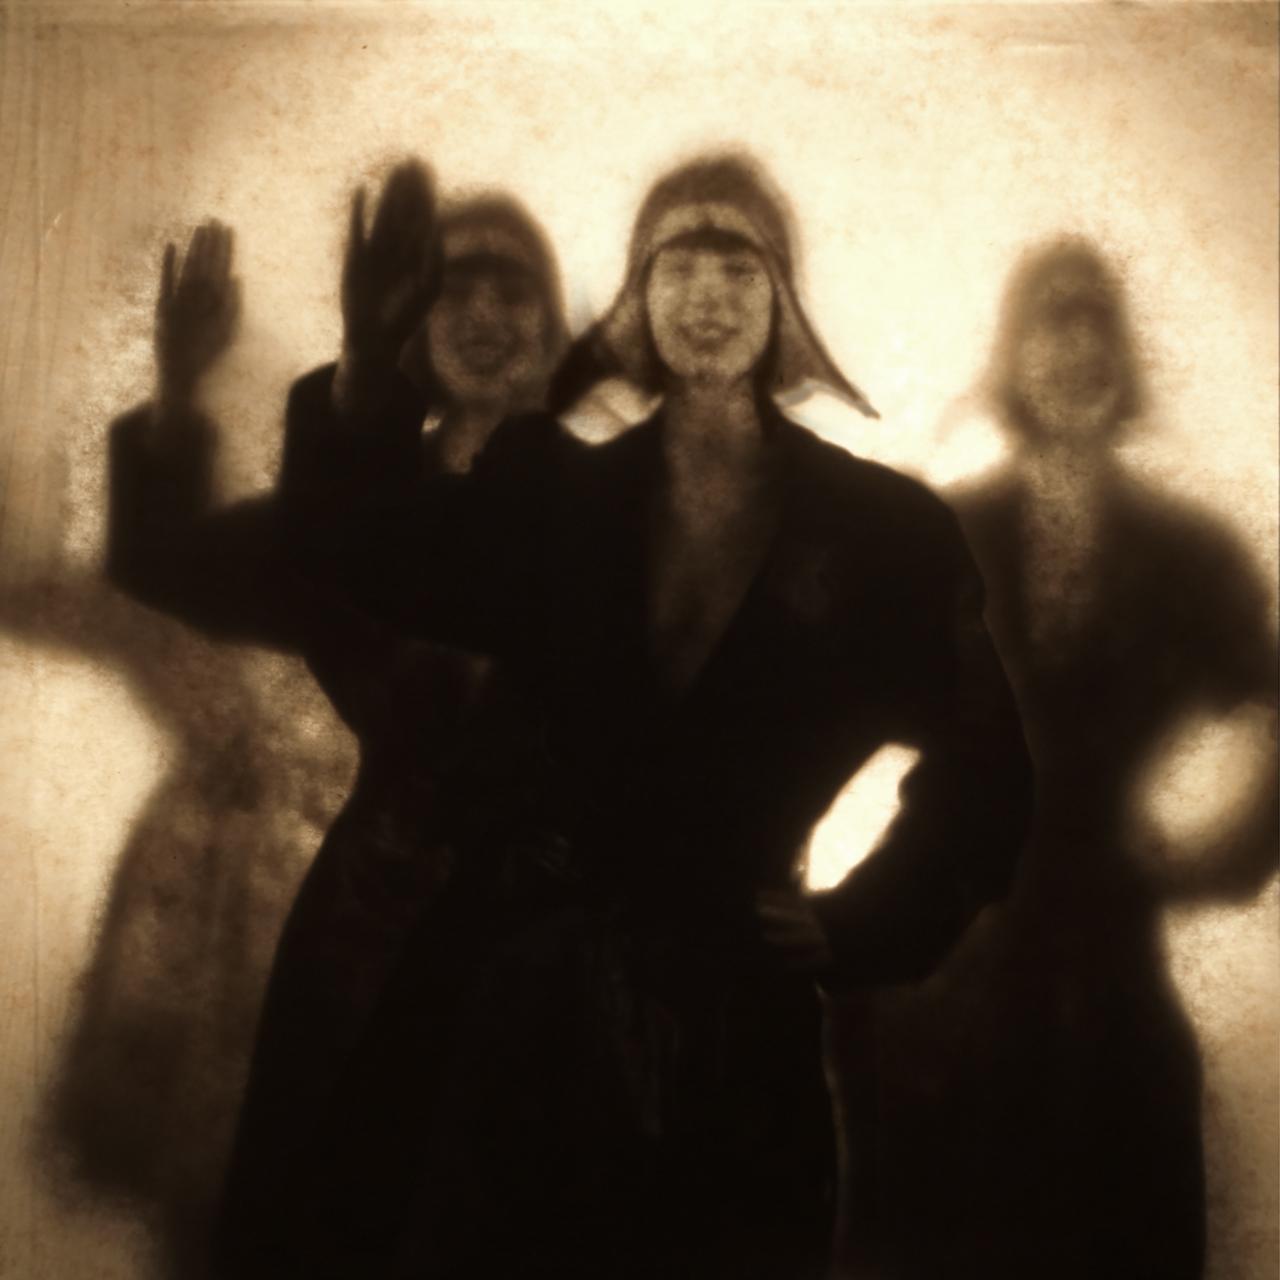 Brigade der winkenden Mädchen #1, André Werner, 2021 Photograph, 40x 40 cm, chromogenic silver halide print. Ed. 10 / 2 AP